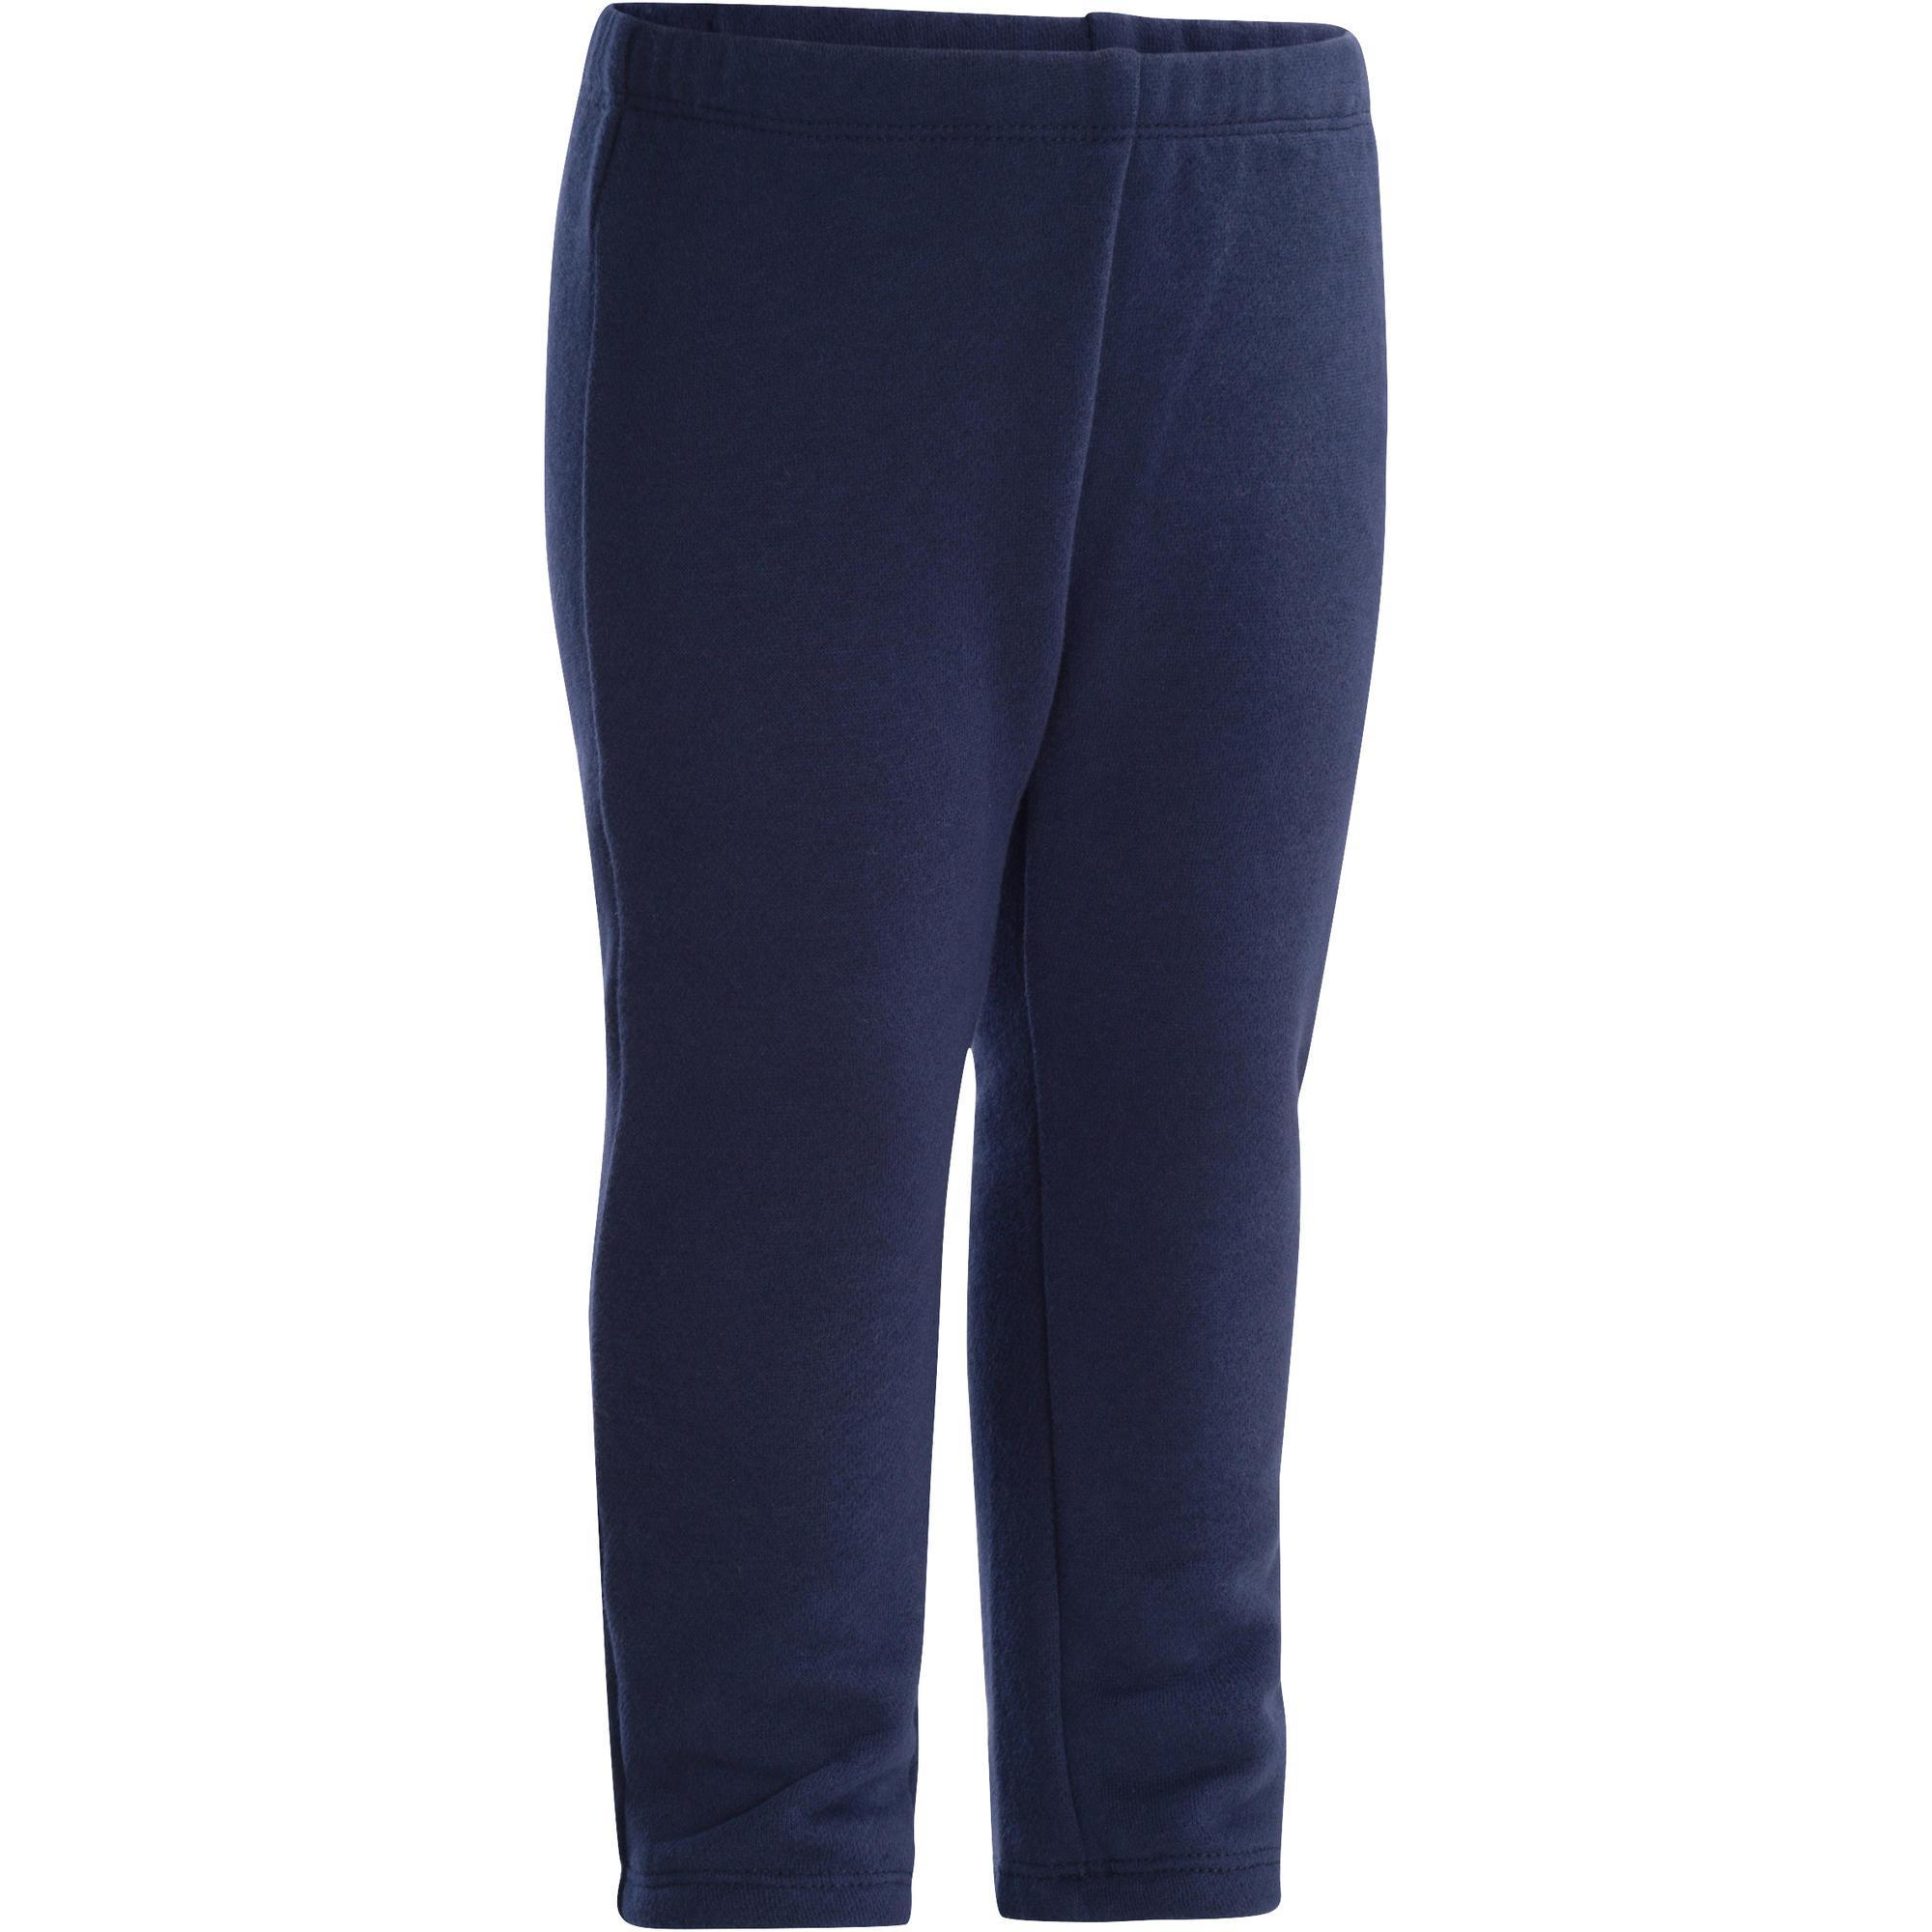 Pantalon 100 chaud baby gym bleu marine domyos